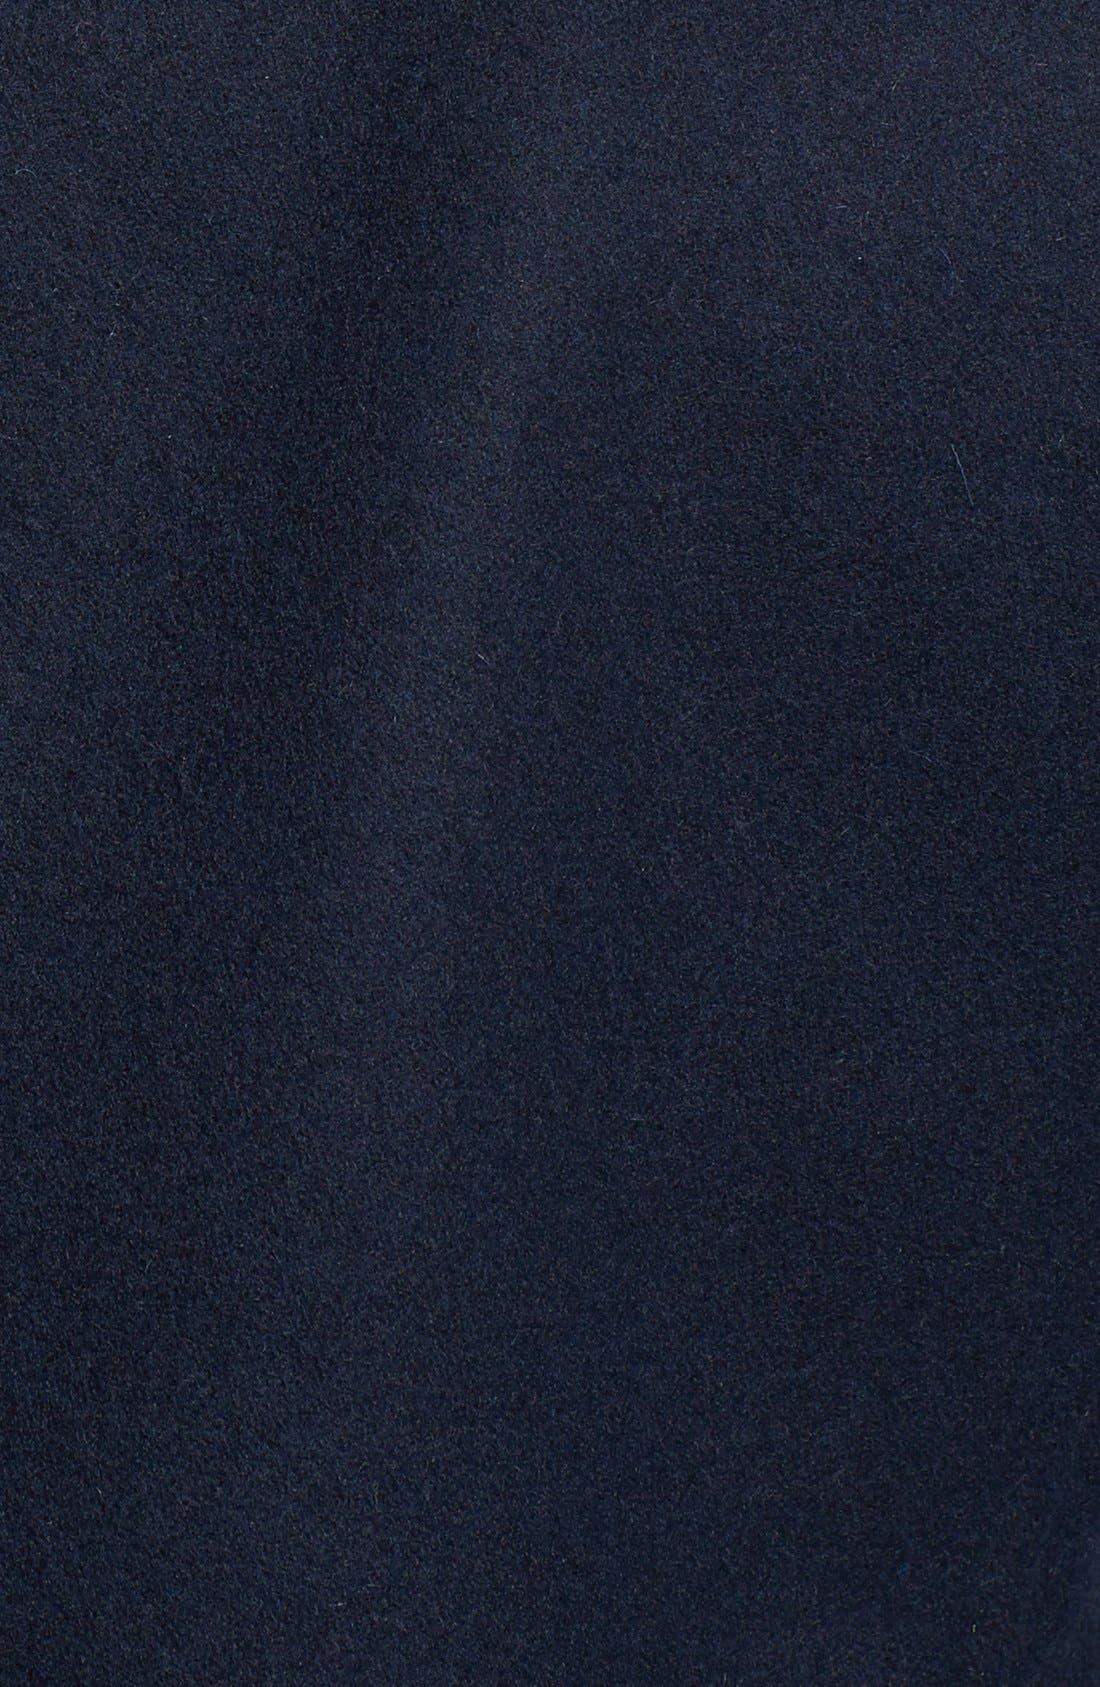 'Radar Garber' Wool Blend Jacket,                             Alternate thumbnail 2, color,                             400